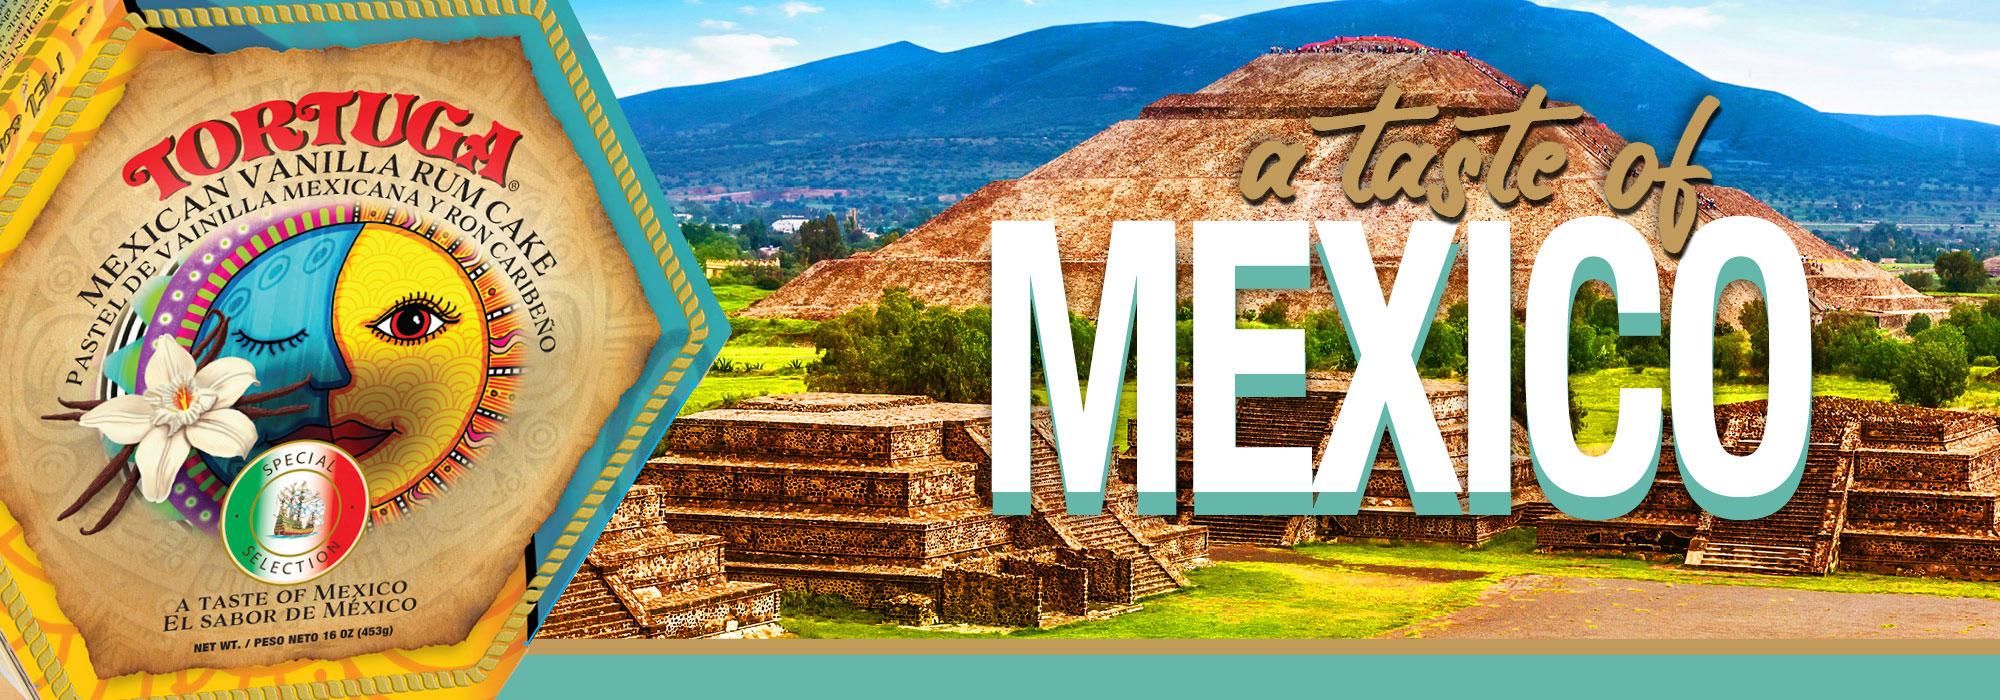 banner-mexico-1a.jpg